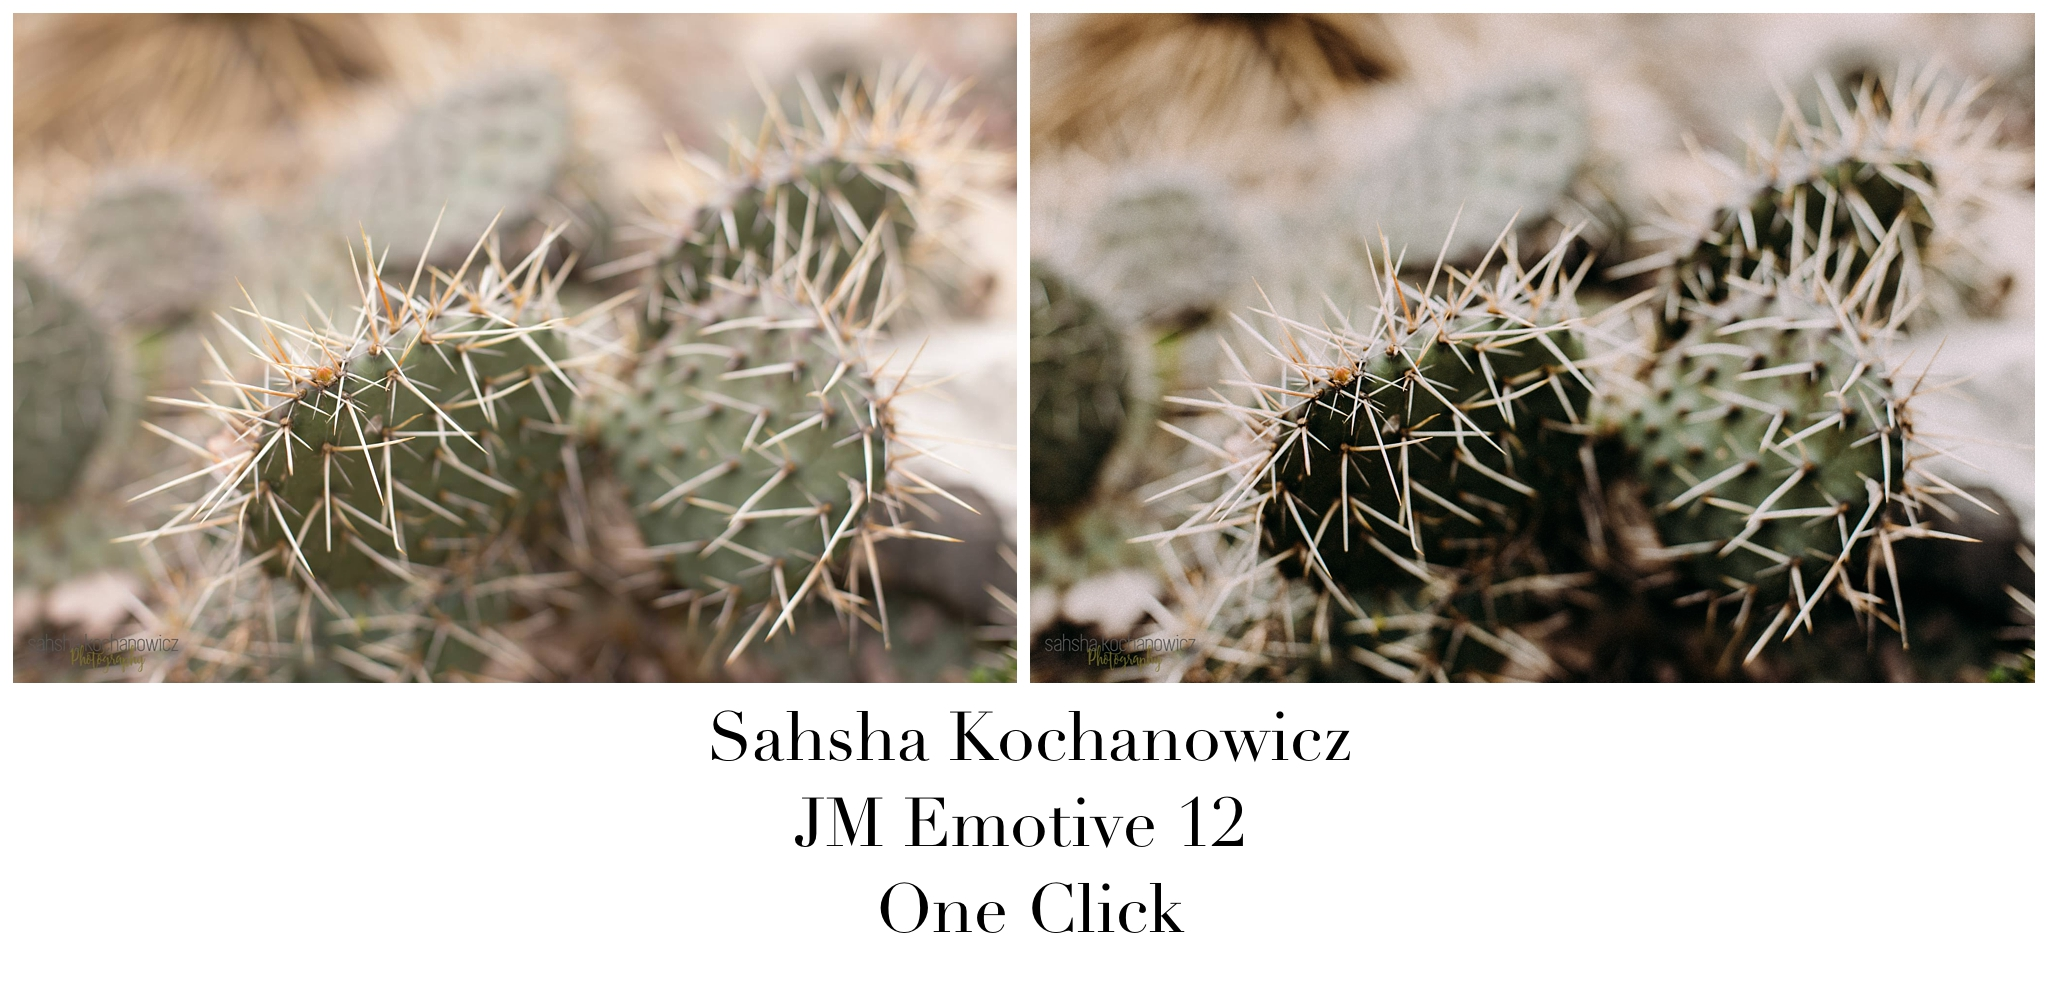 Sahsha Kochanowicz